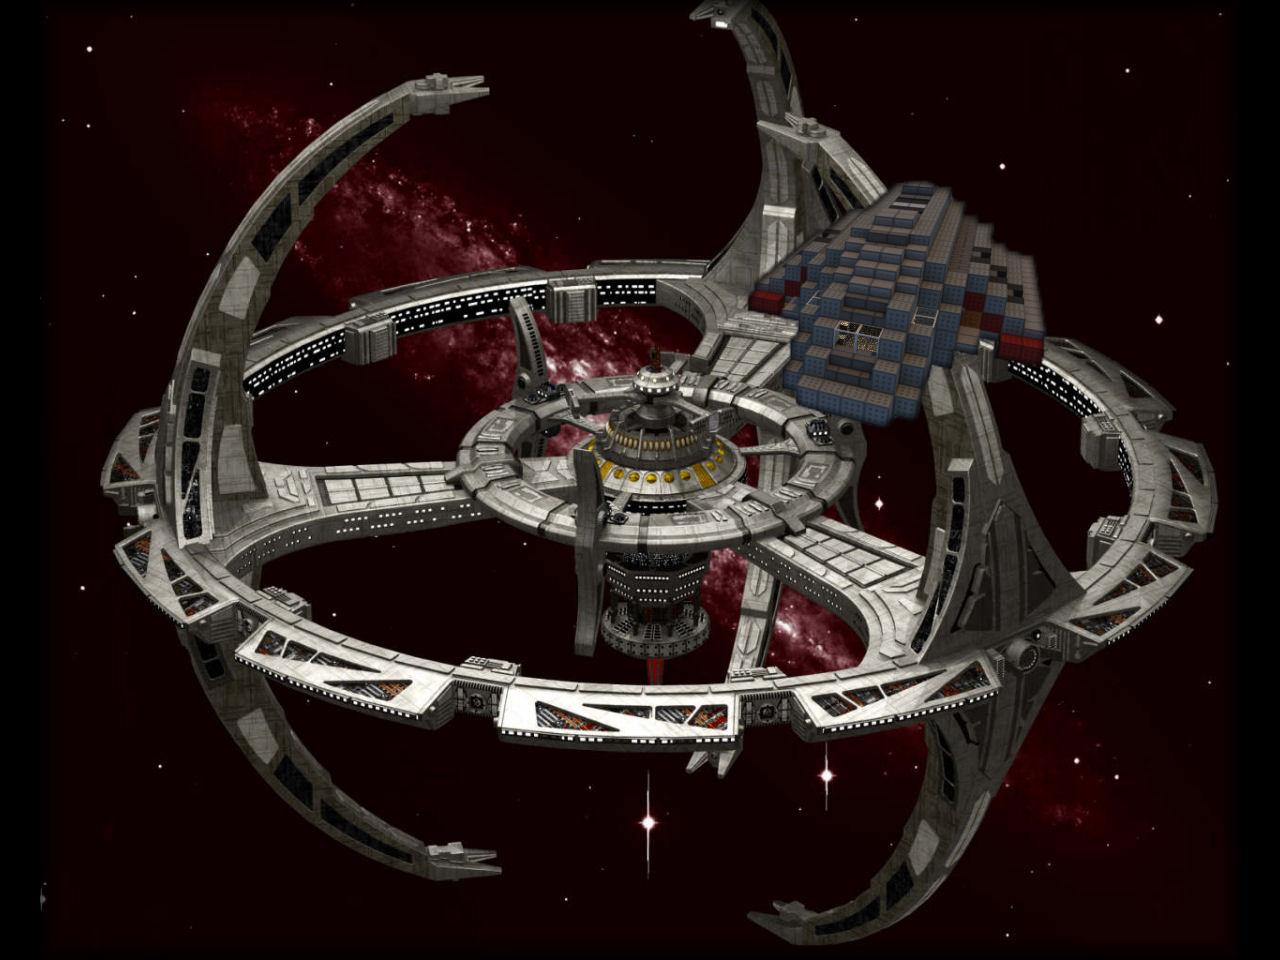 Star Trek Danube Runabout 1 1 scale (Zeppelin mod compatible